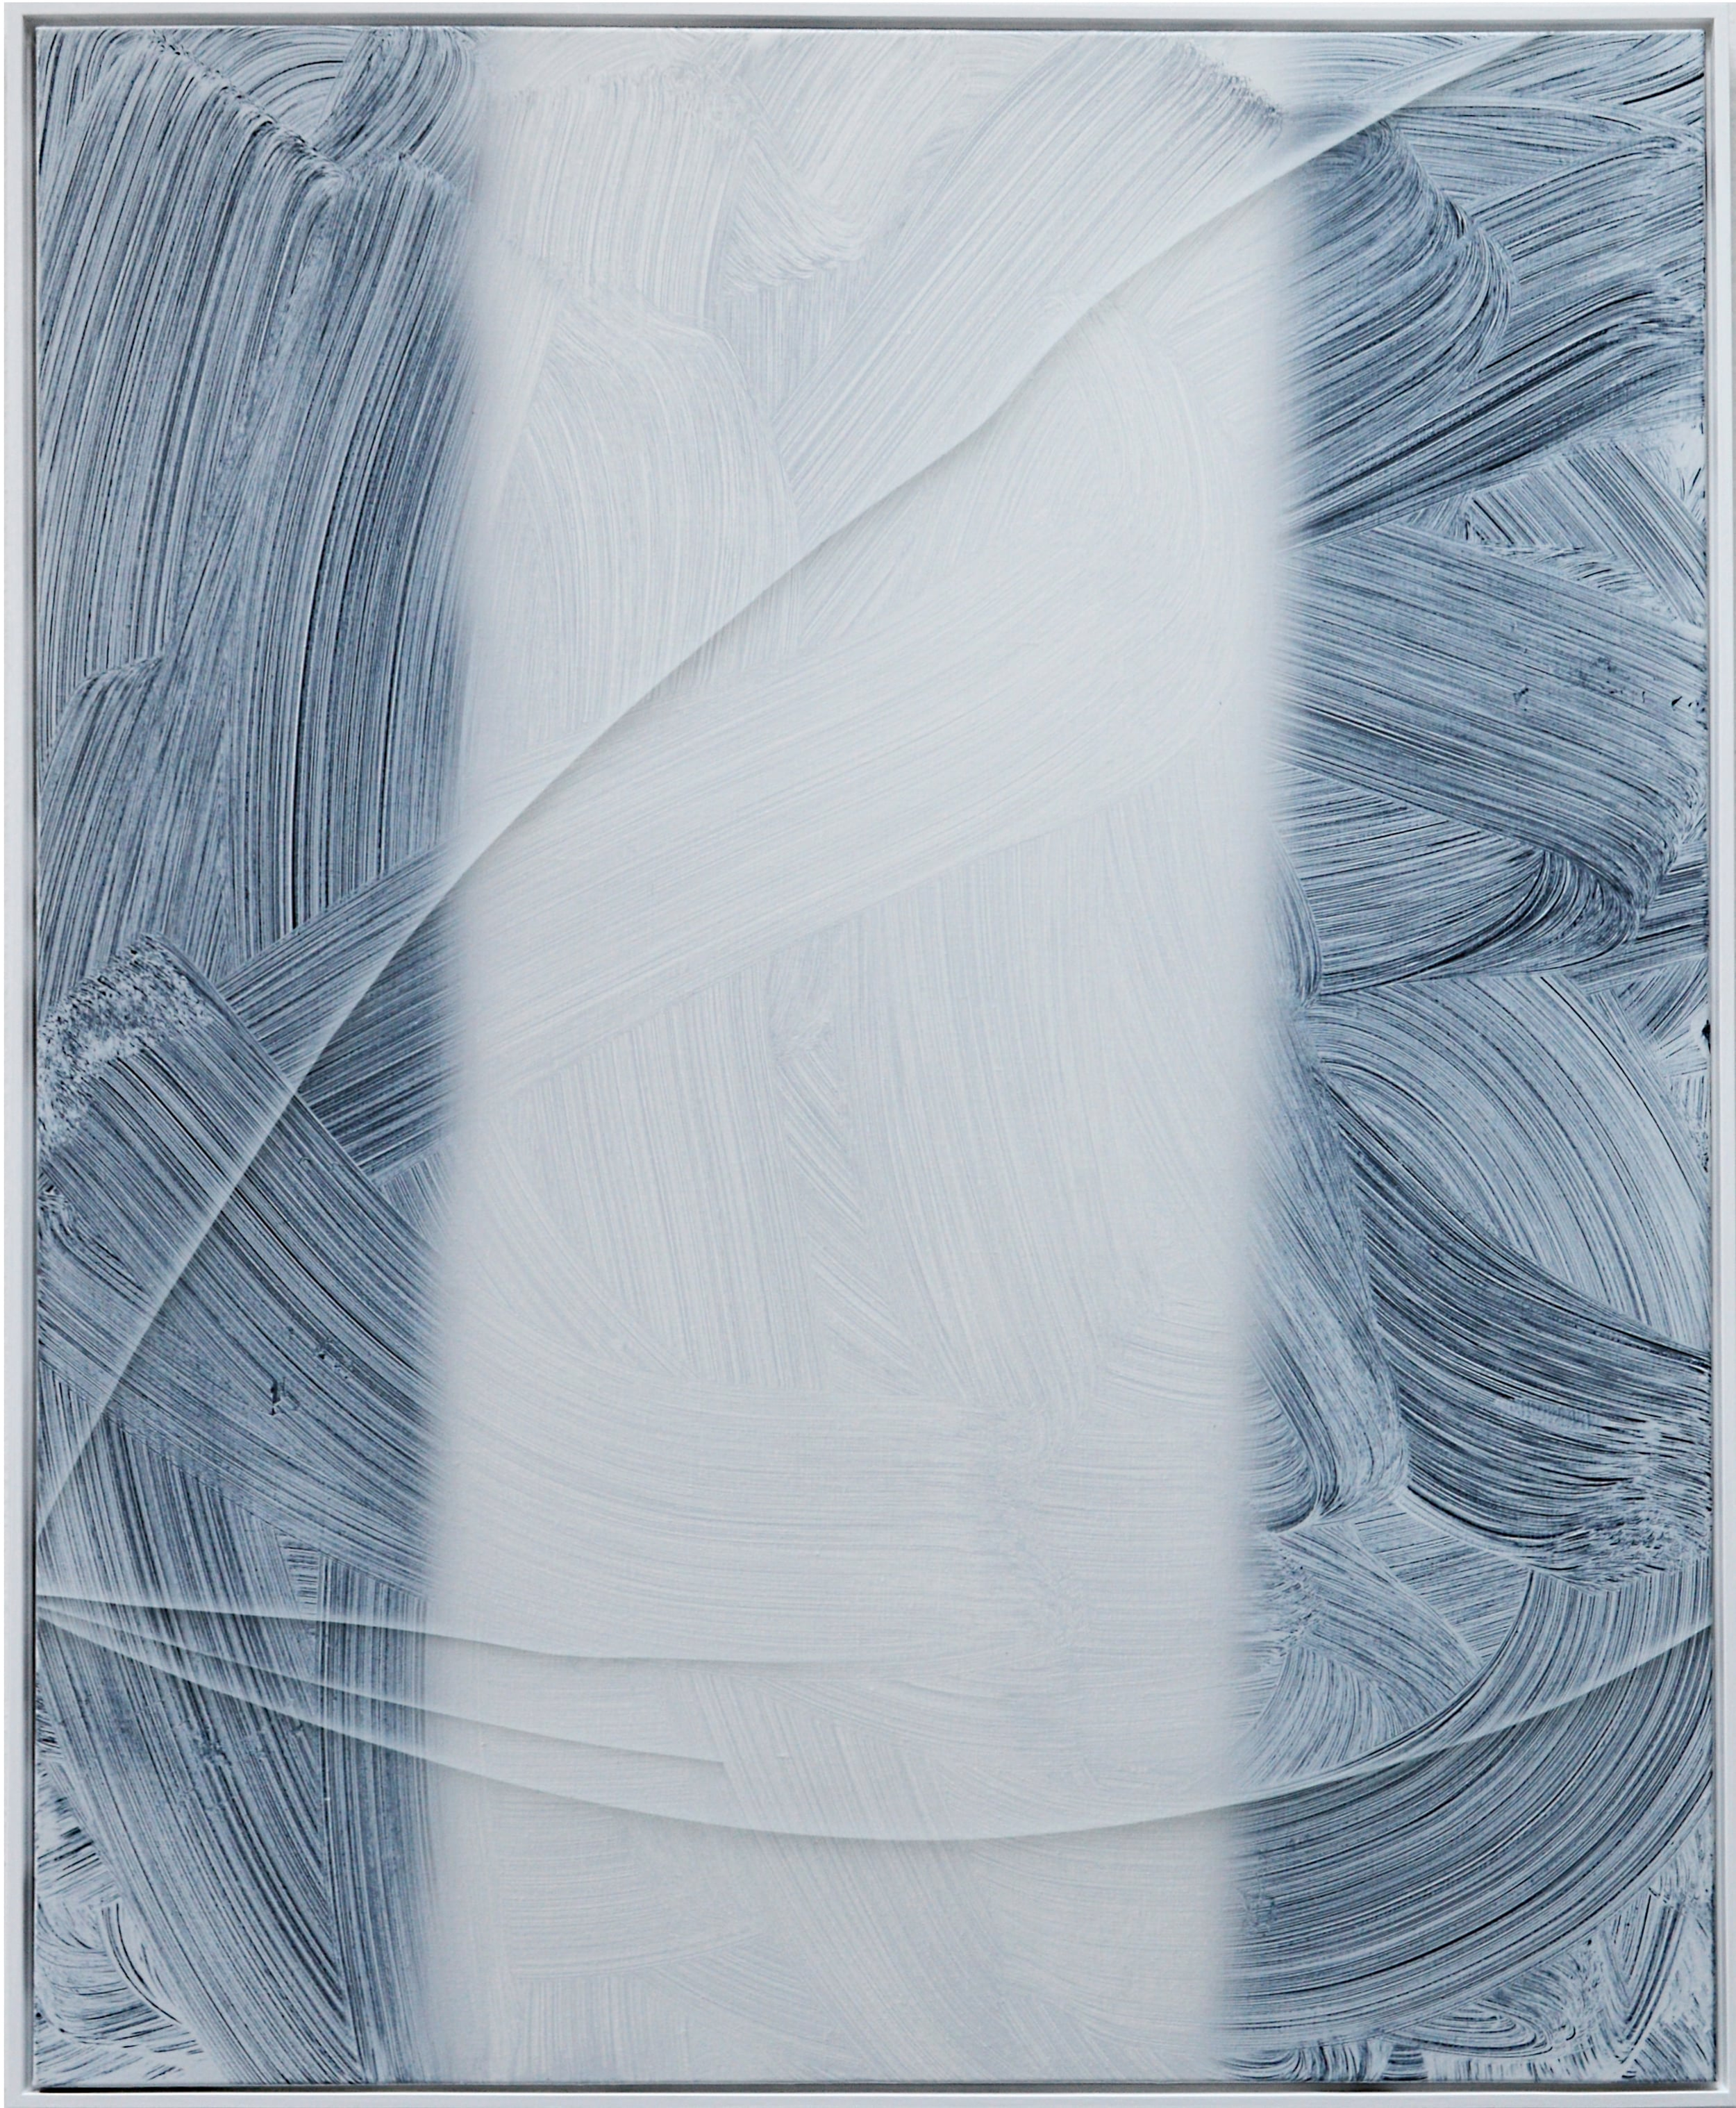 Silver Lining | 2015 acylic on linen 140 x 115 cm